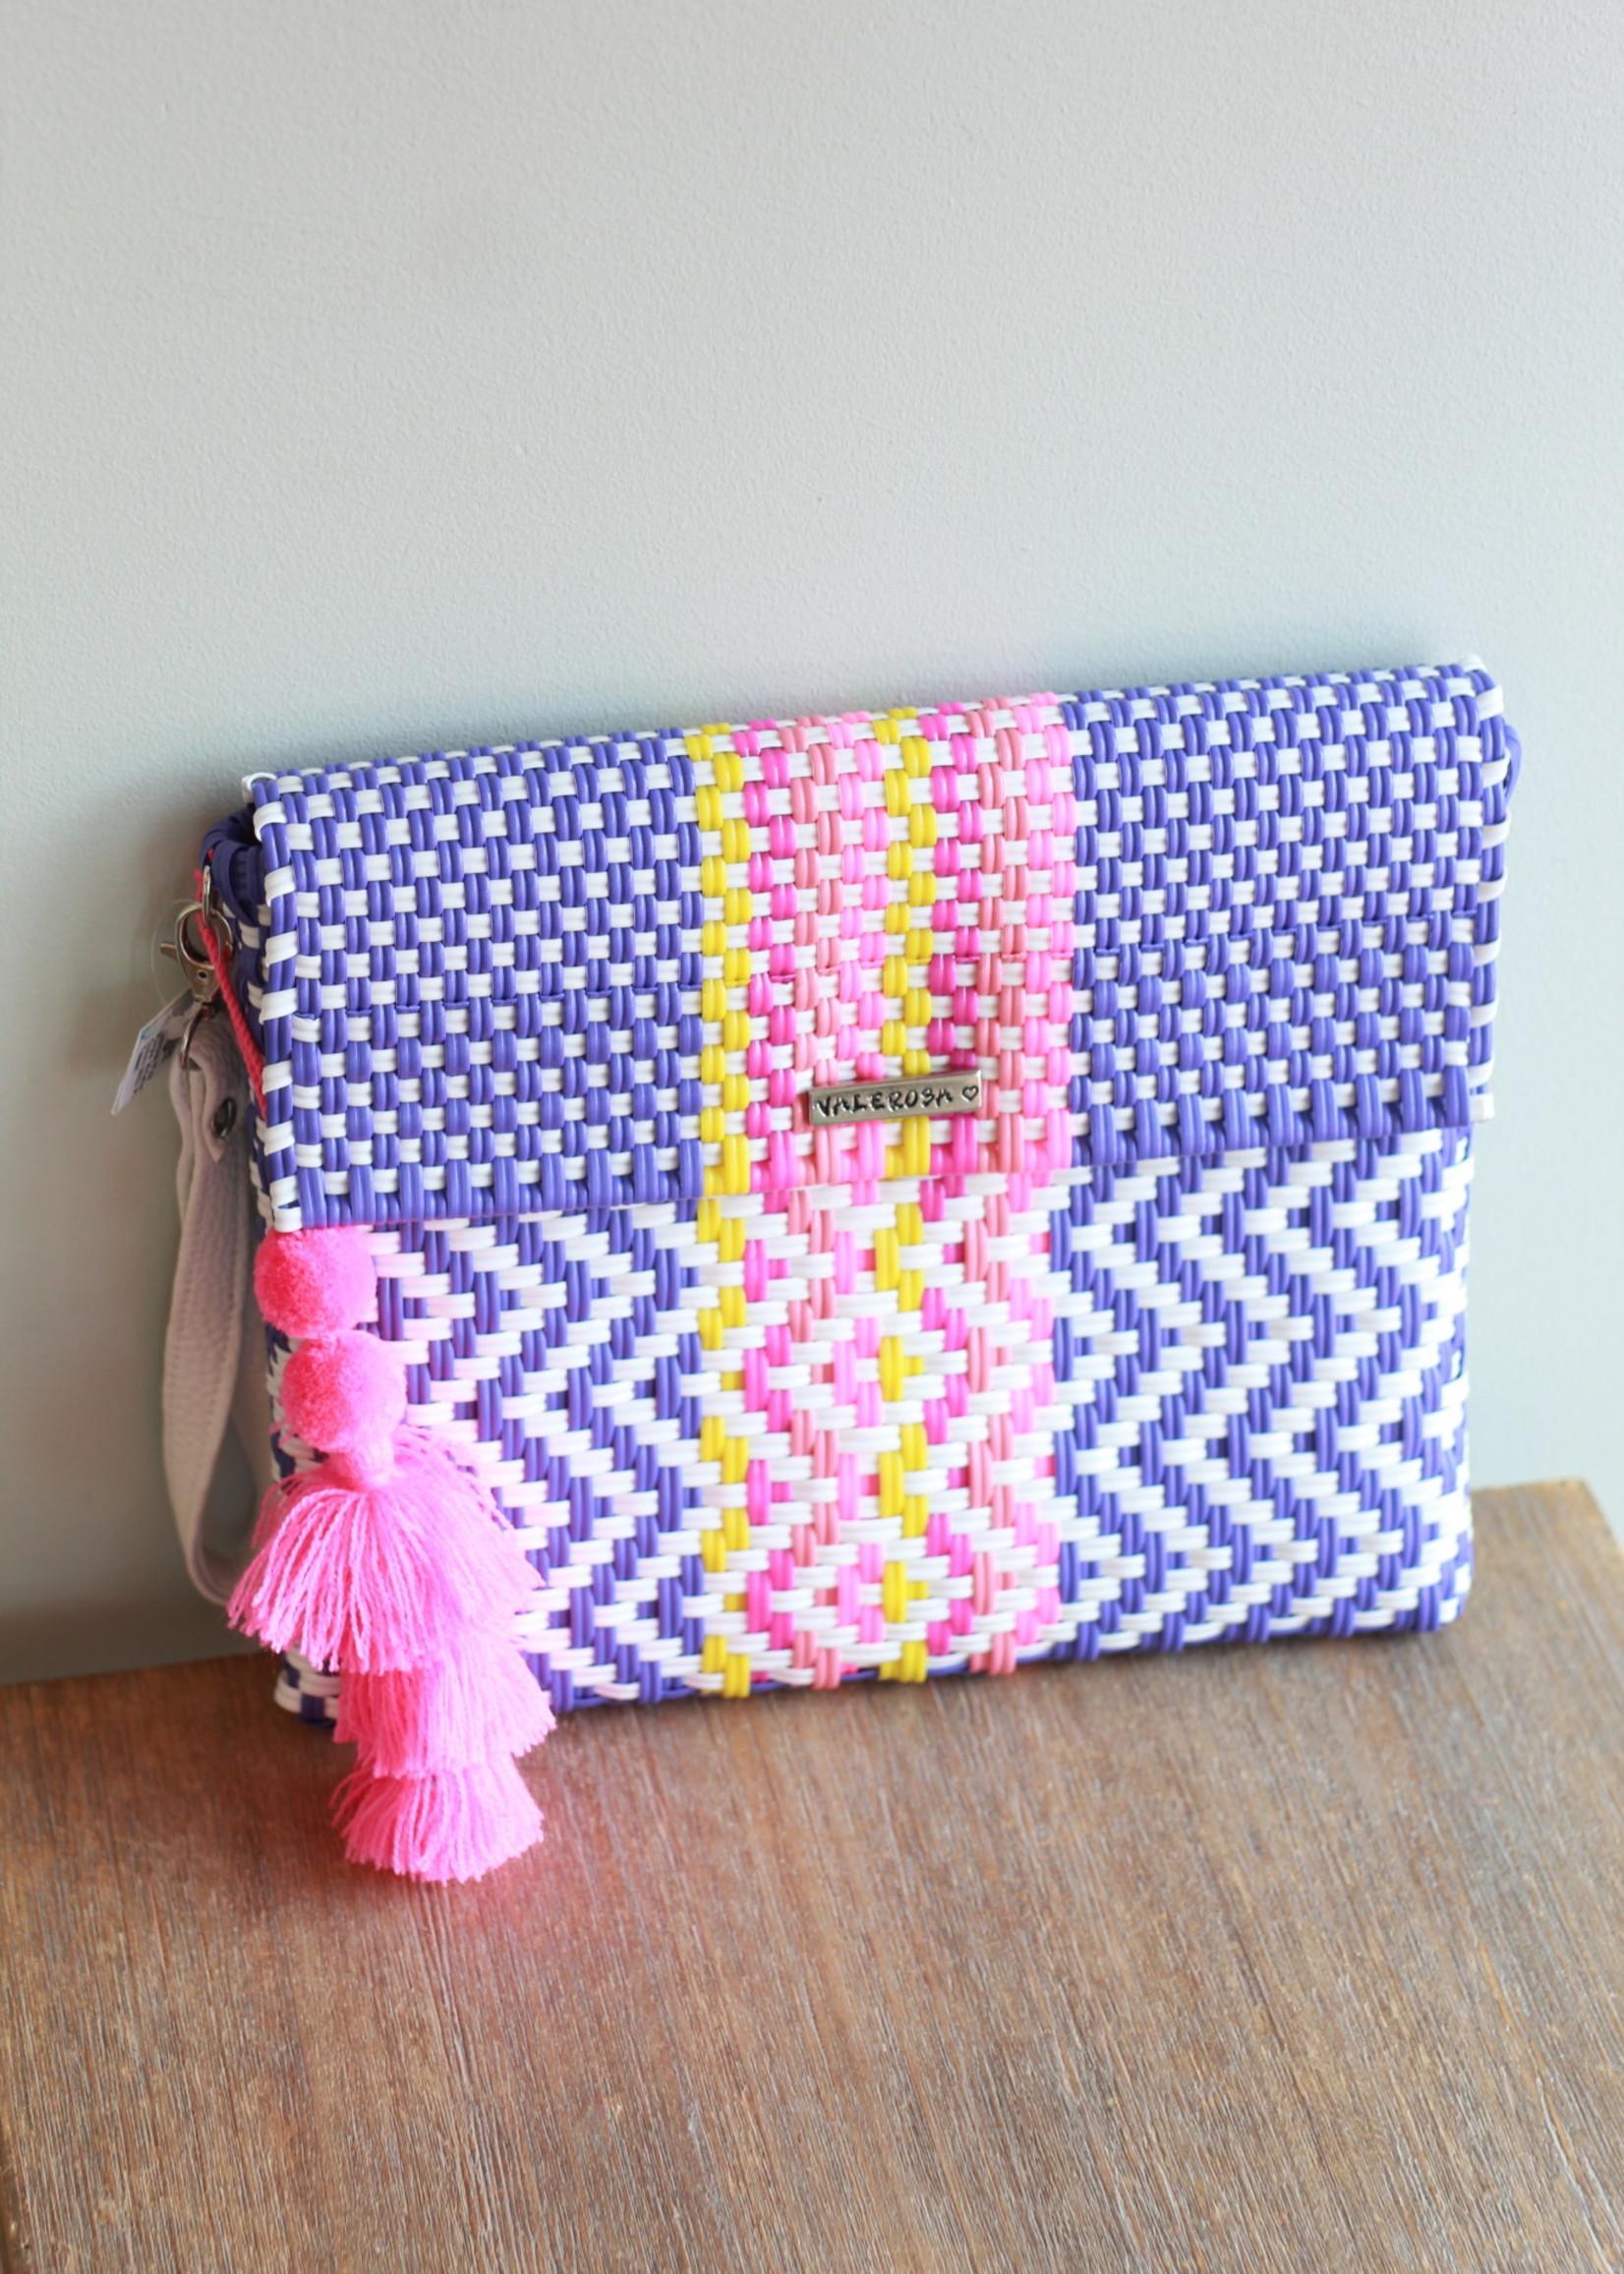 Valerosa Boutique Valerosa Pink & Purple Wristlet Clutch With Pink Tassel